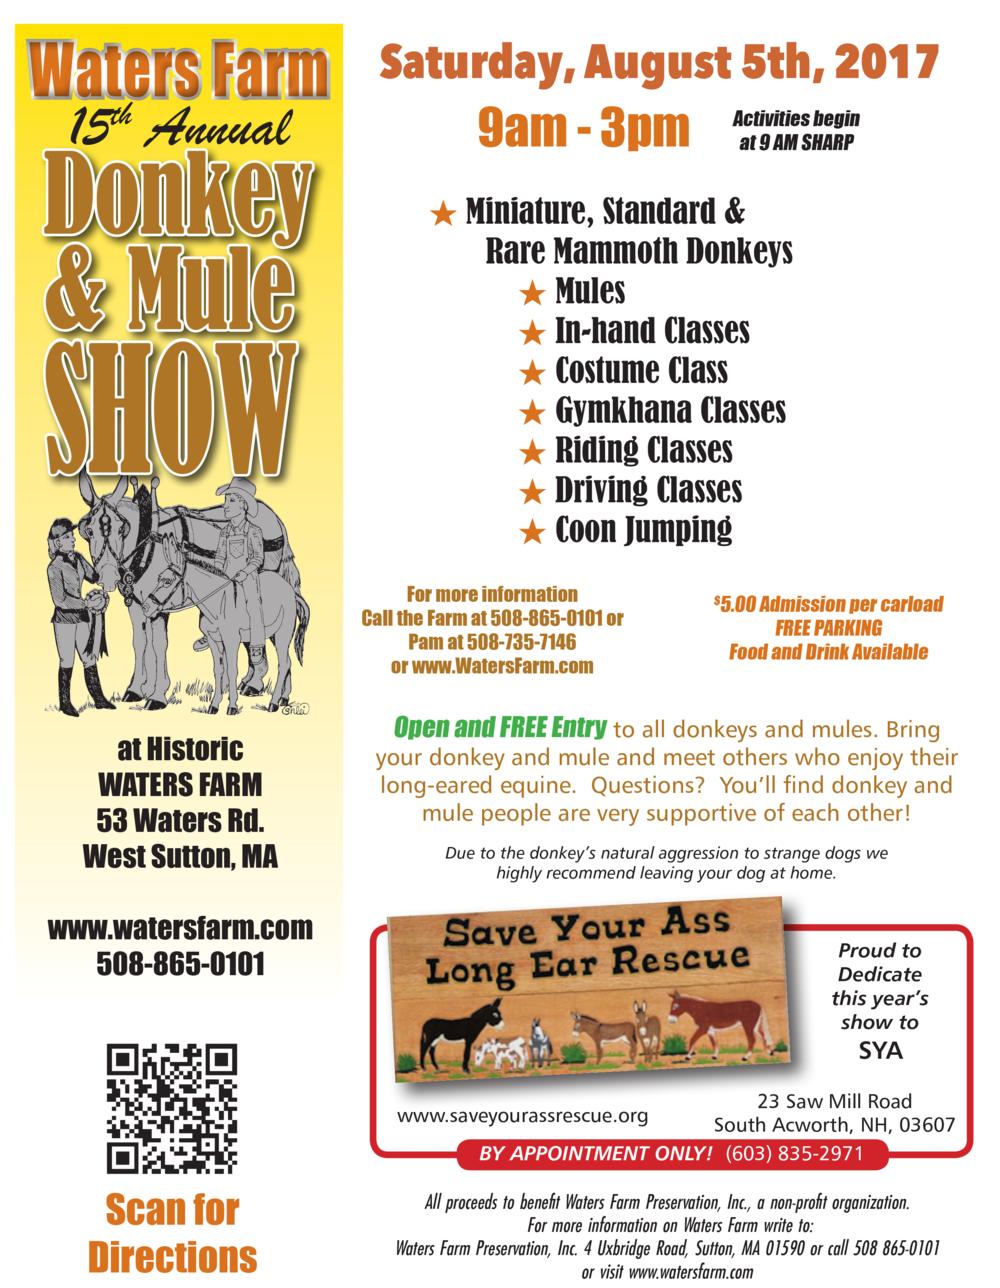 donkeyshow-raindate.png